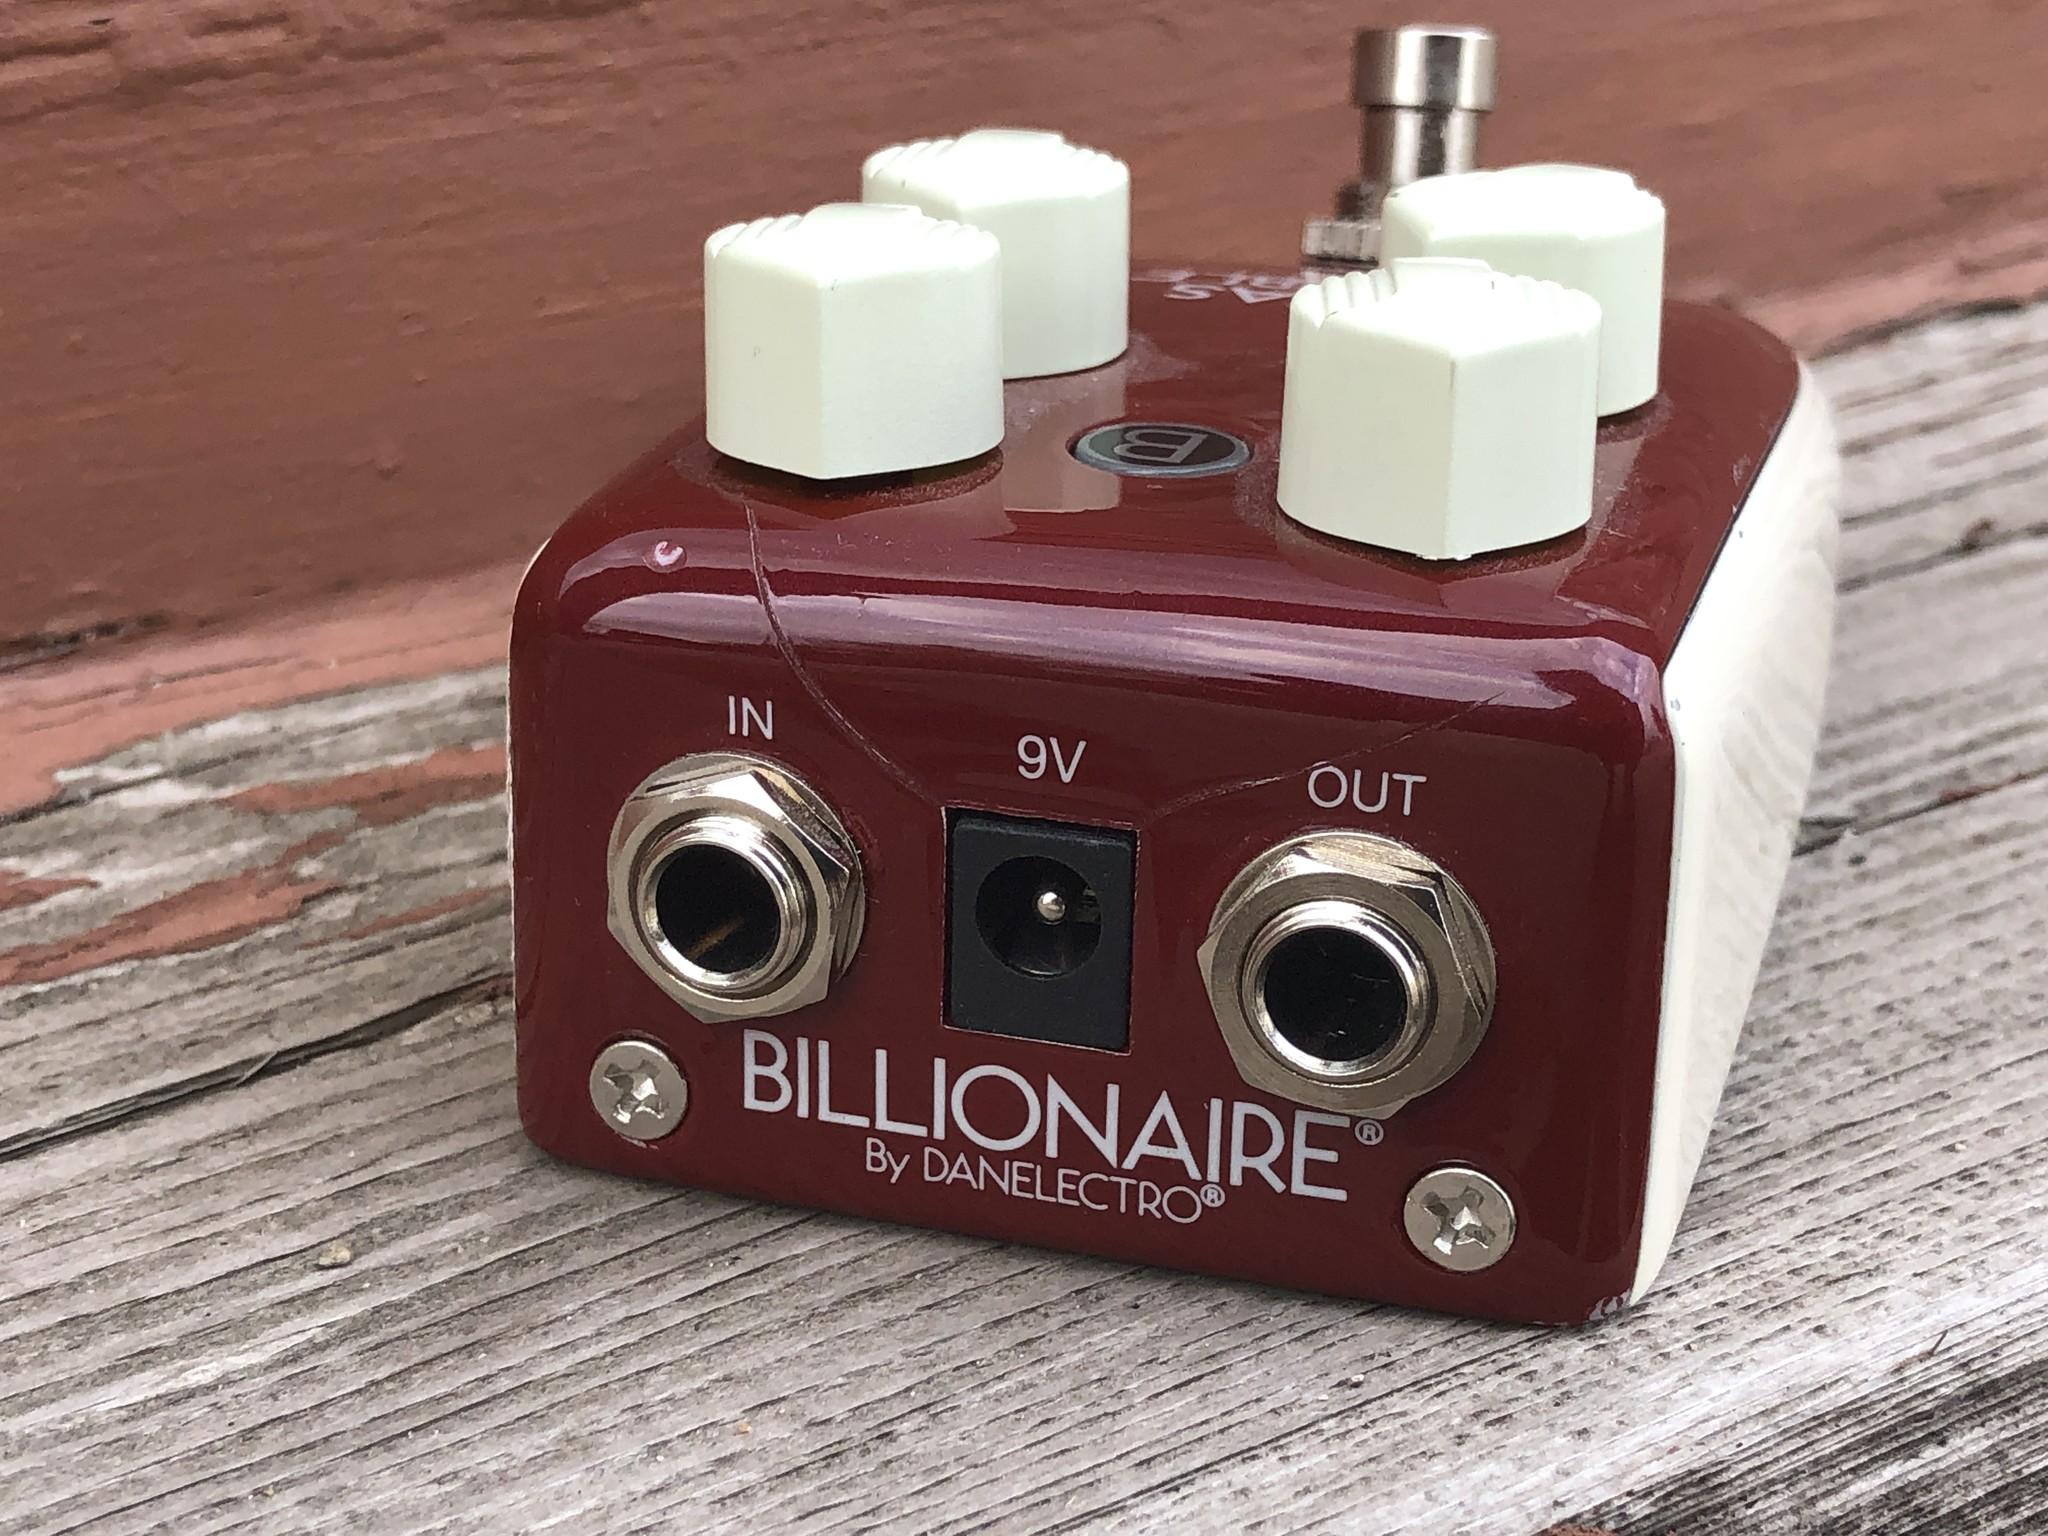 Danelectro Billionaire  Texas Trouble Overdrive-4